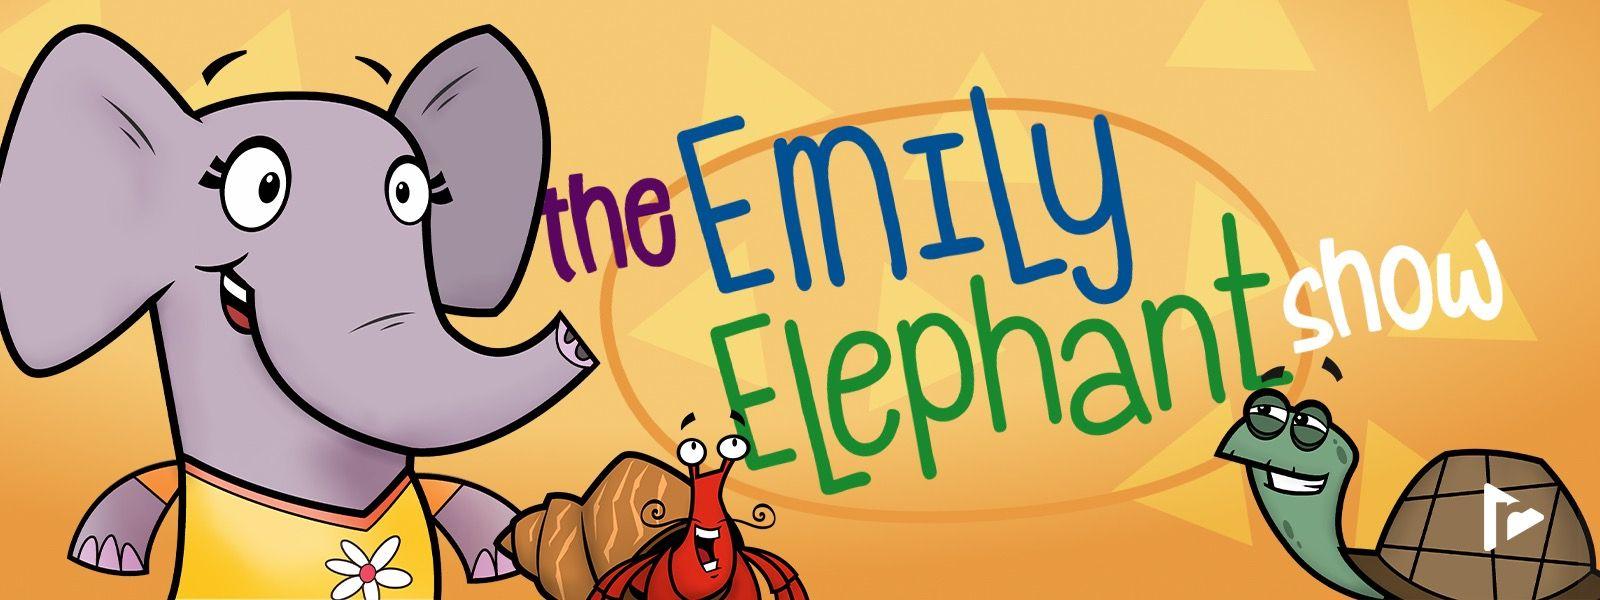 The Emily the Elephant Show